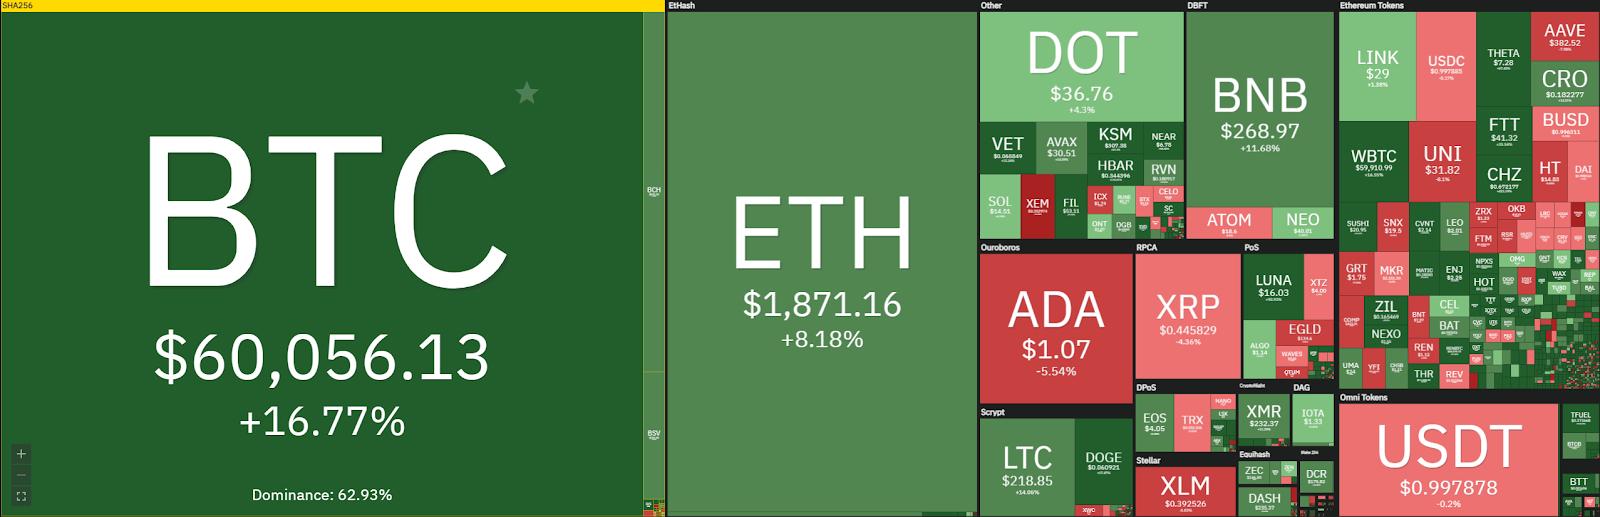 Weekly Crypto Price Analysis 14th Mar: BTC, ETH, XRP, DOT, VET 1